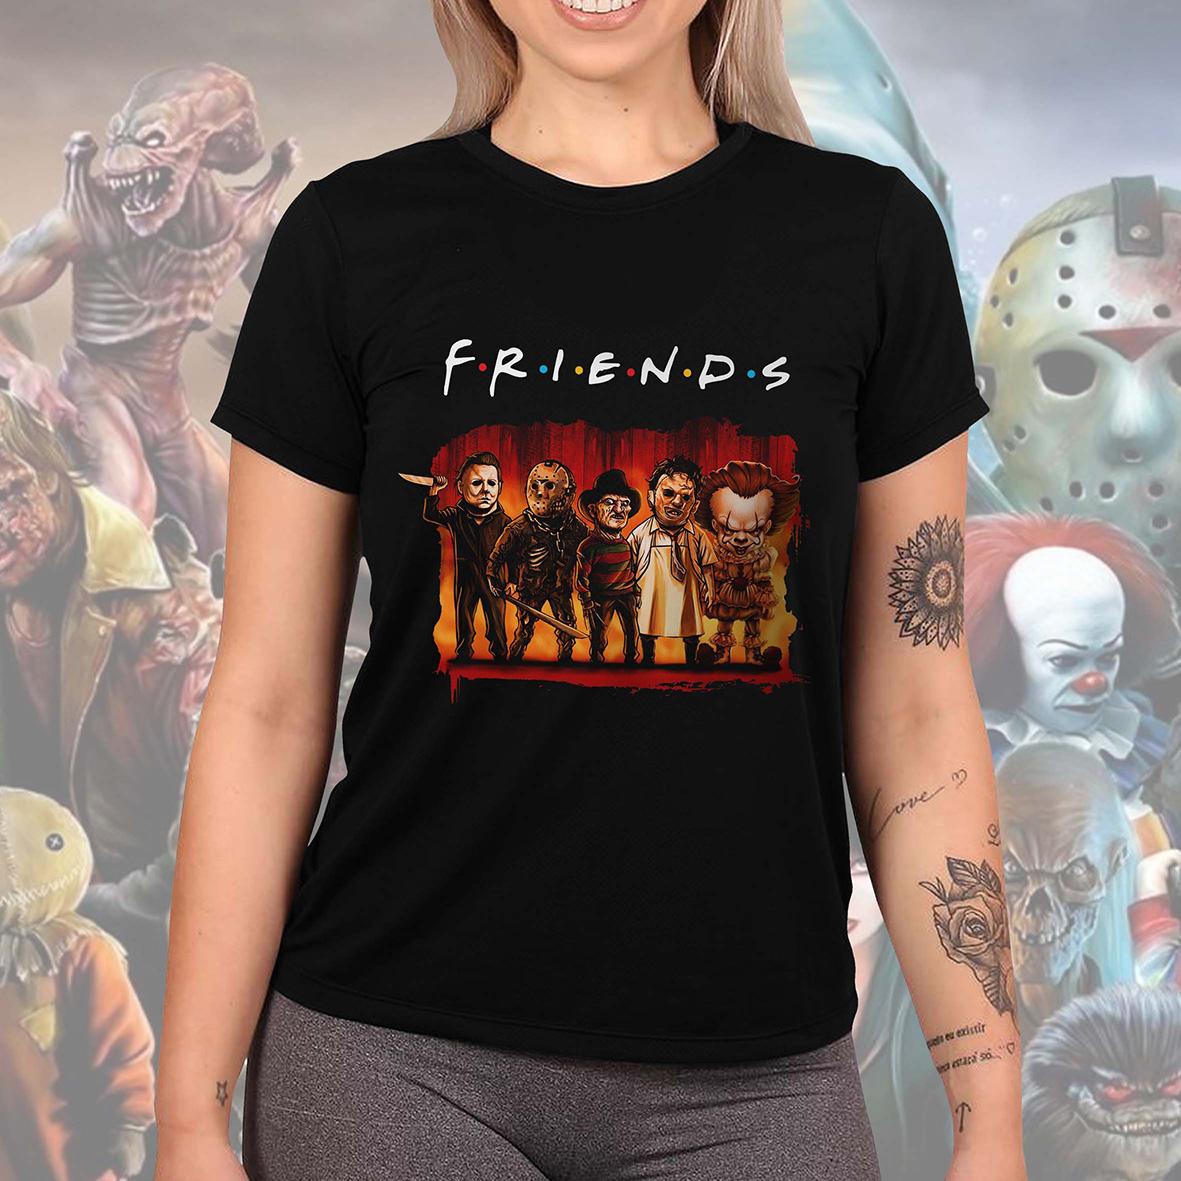 Camiseta Feminina Unissex Friends Halloween Horror Serial Killers Terror Personagens (Preta) - EV